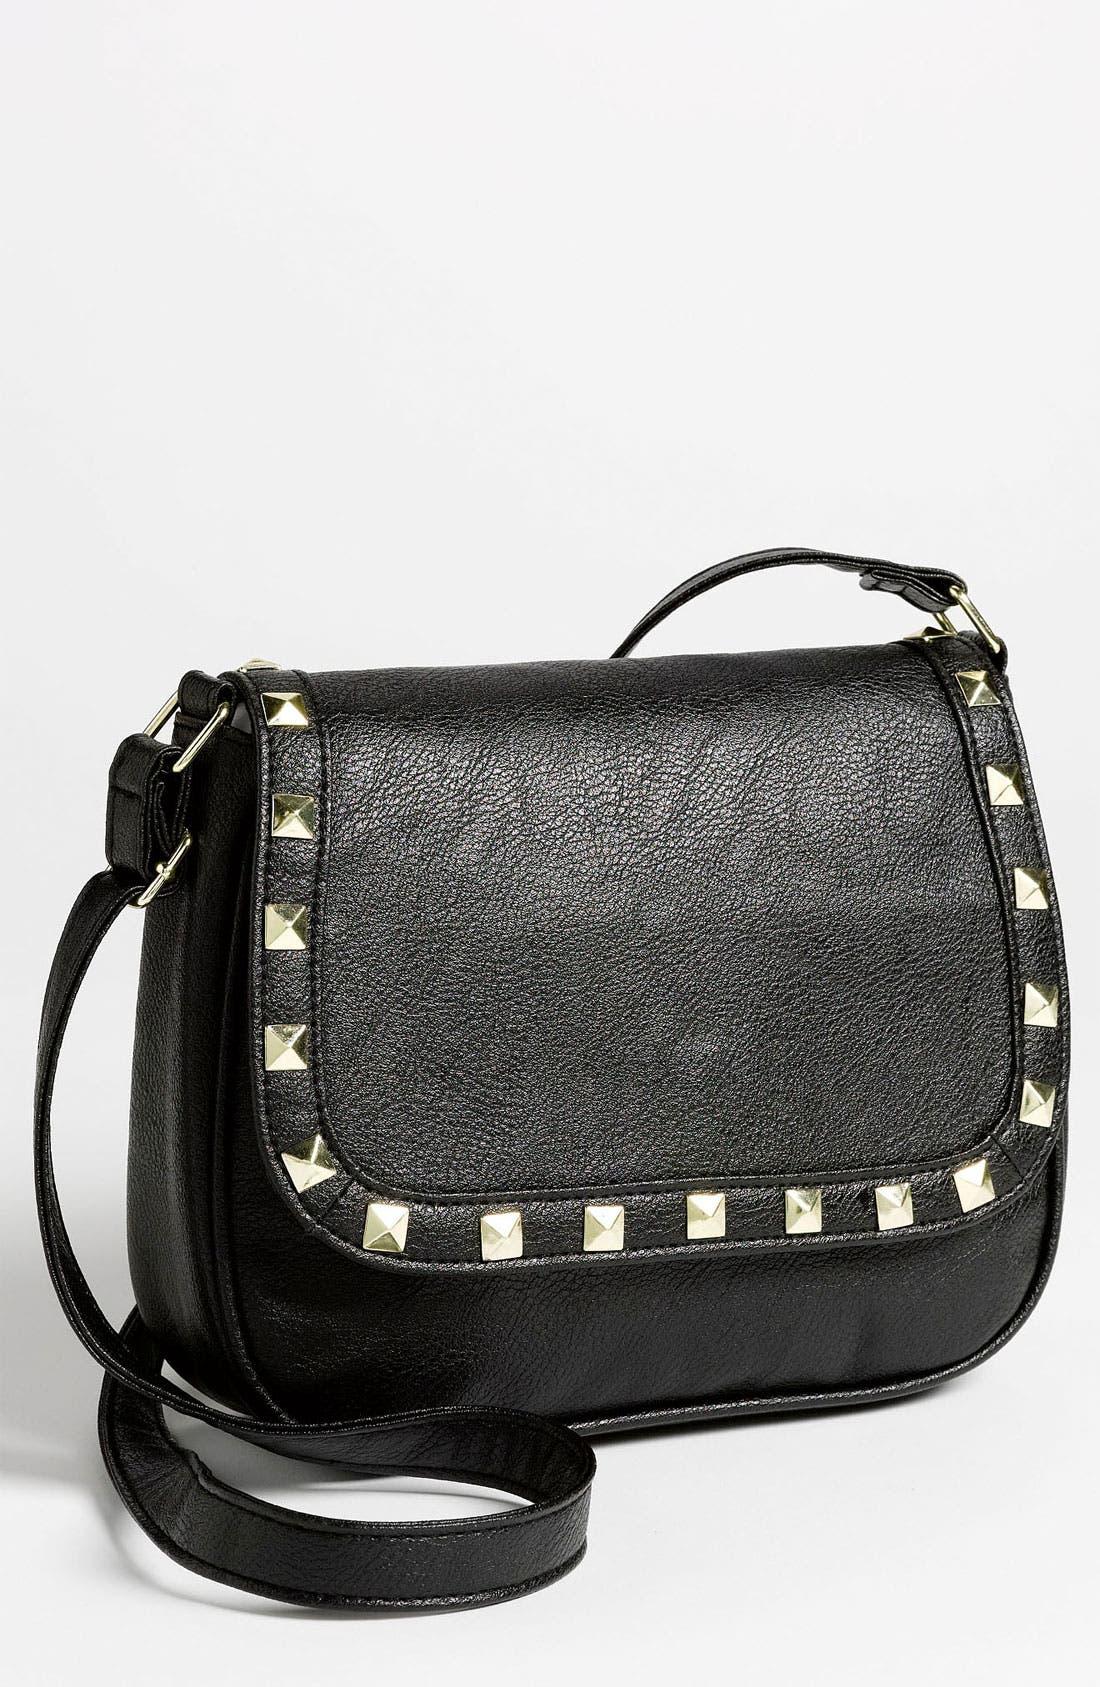 Alternate Image 1 Selected - OMG Studded Crossbody Bag